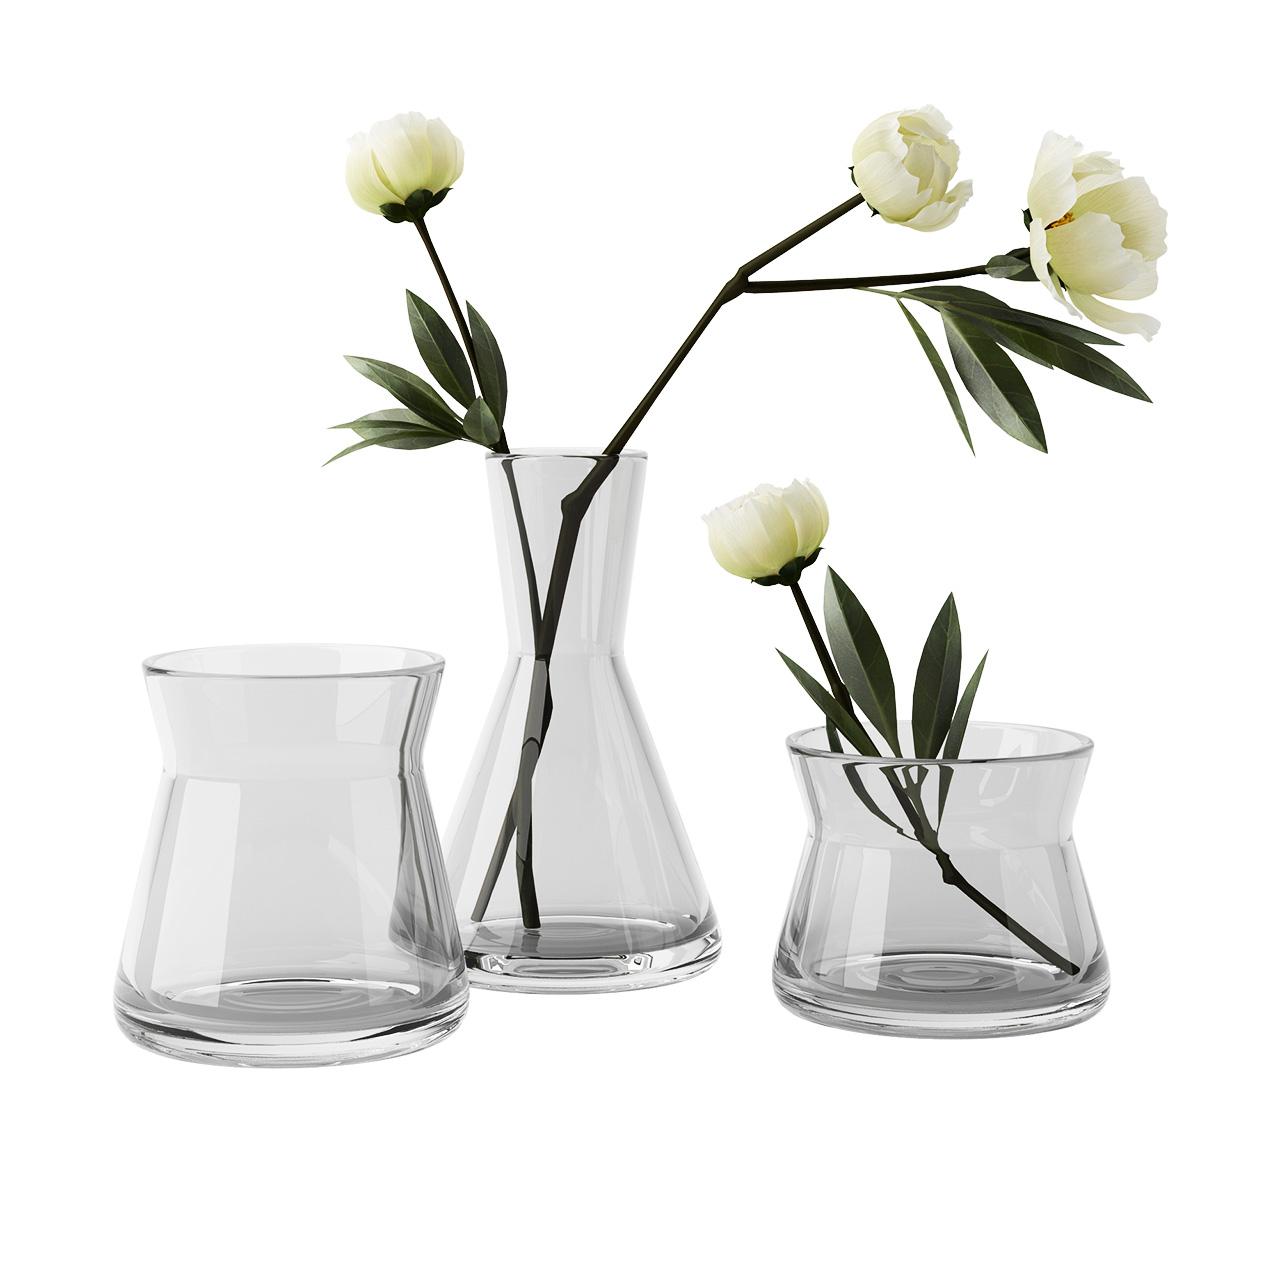 Trio Vases, Set of 3 by Design House Stockholm